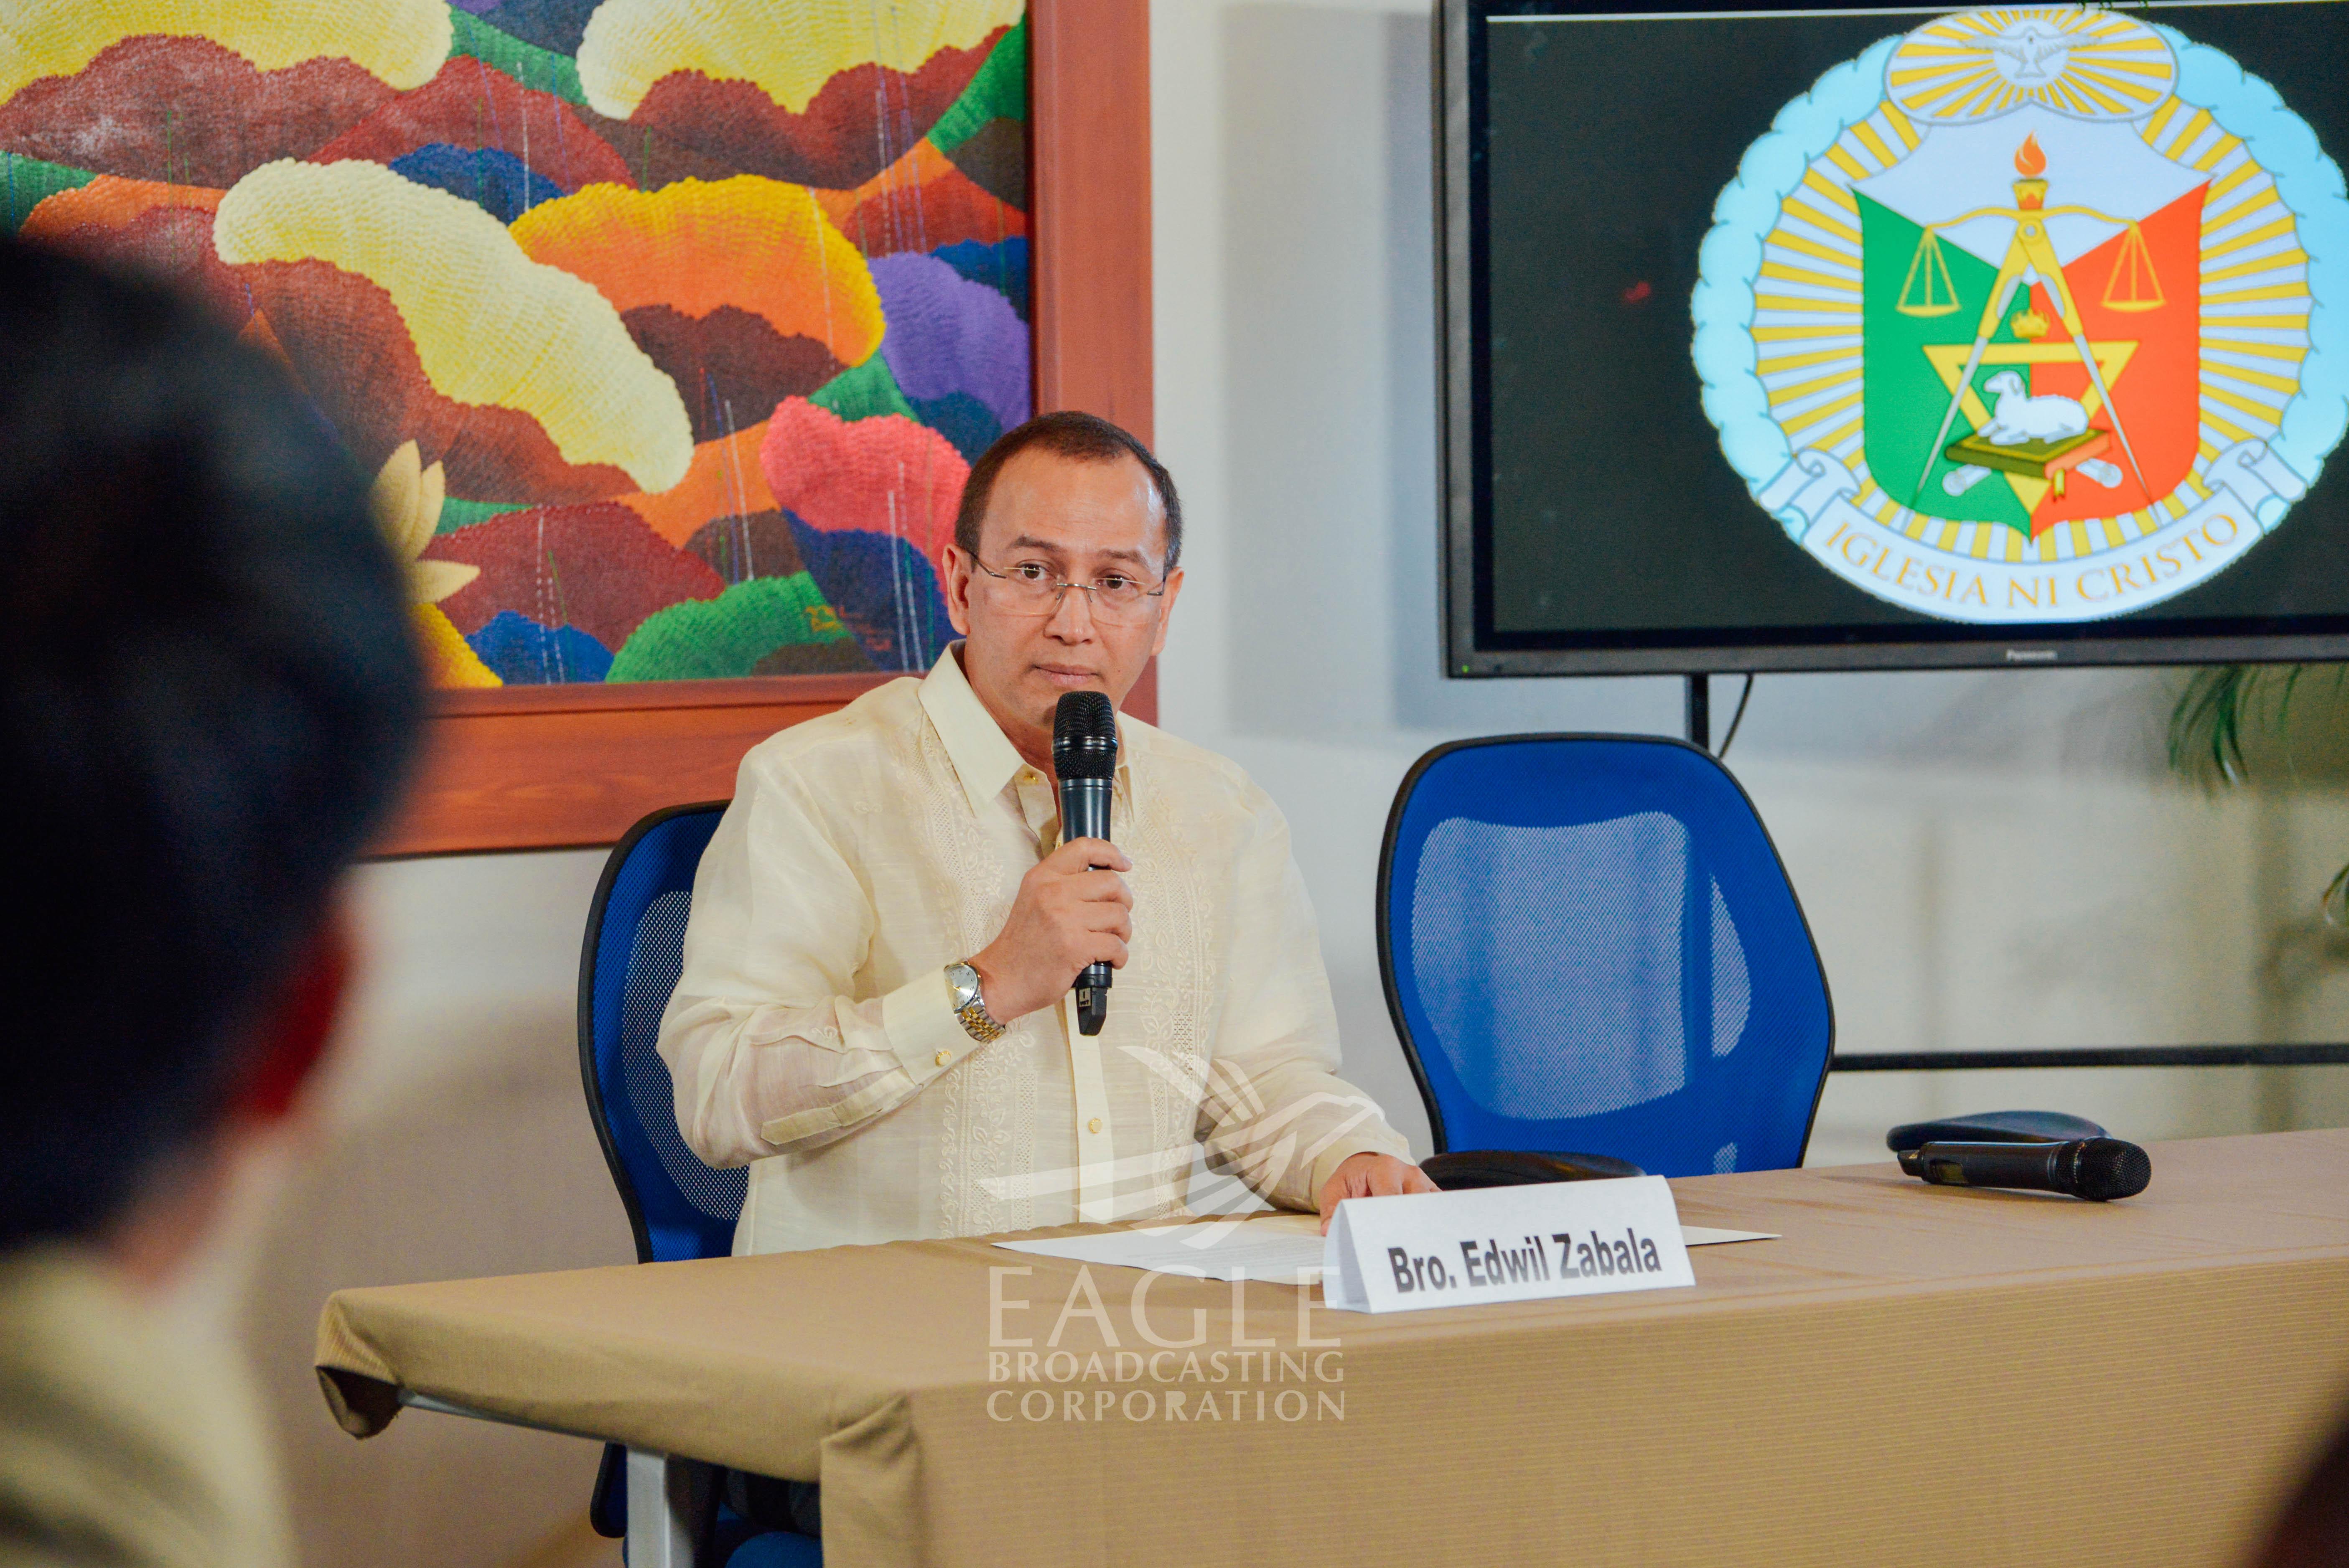 INC conducting own inquiry on Menorca's arrest